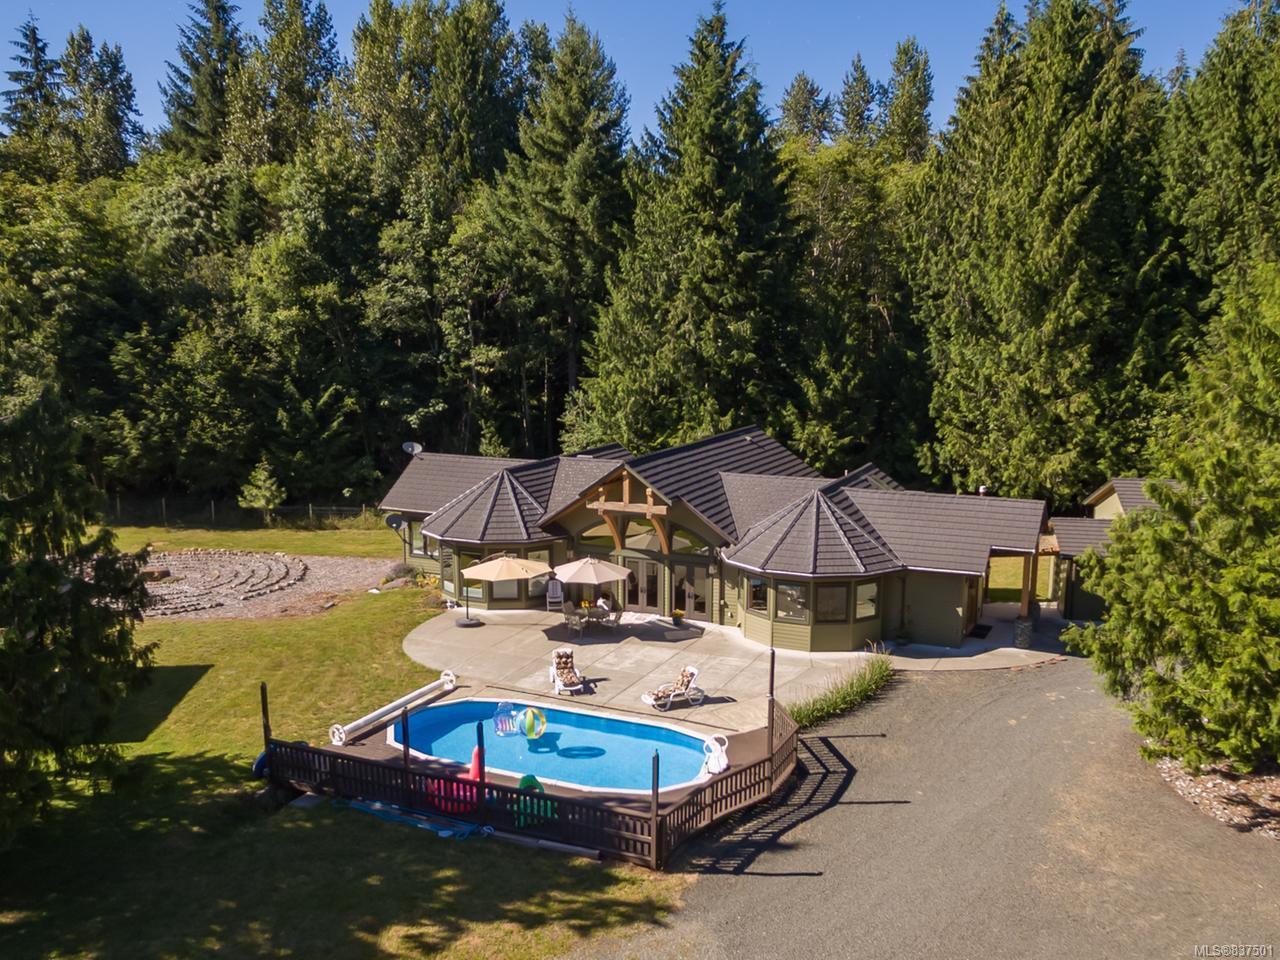 Main Photo: 5584 Prendergast Rd in COURTENAY: CV Courtenay West House for sale (Comox Valley)  : MLS®# 837501